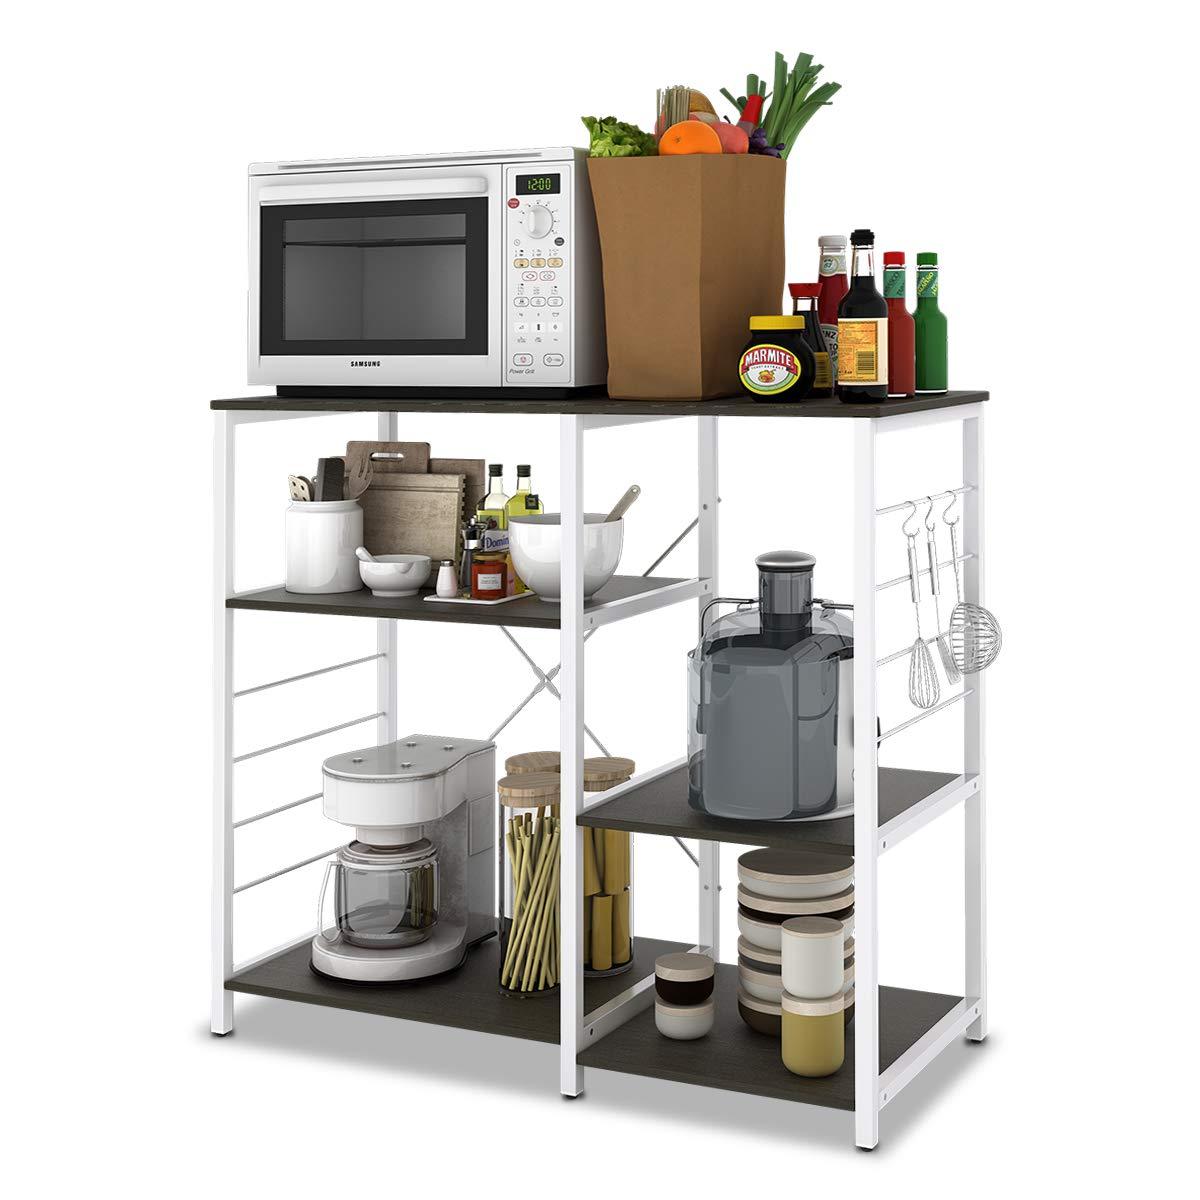 WLIVE Multi-Purpose Wood Kitchen Cart (Black) by WLIVE (Image #1)